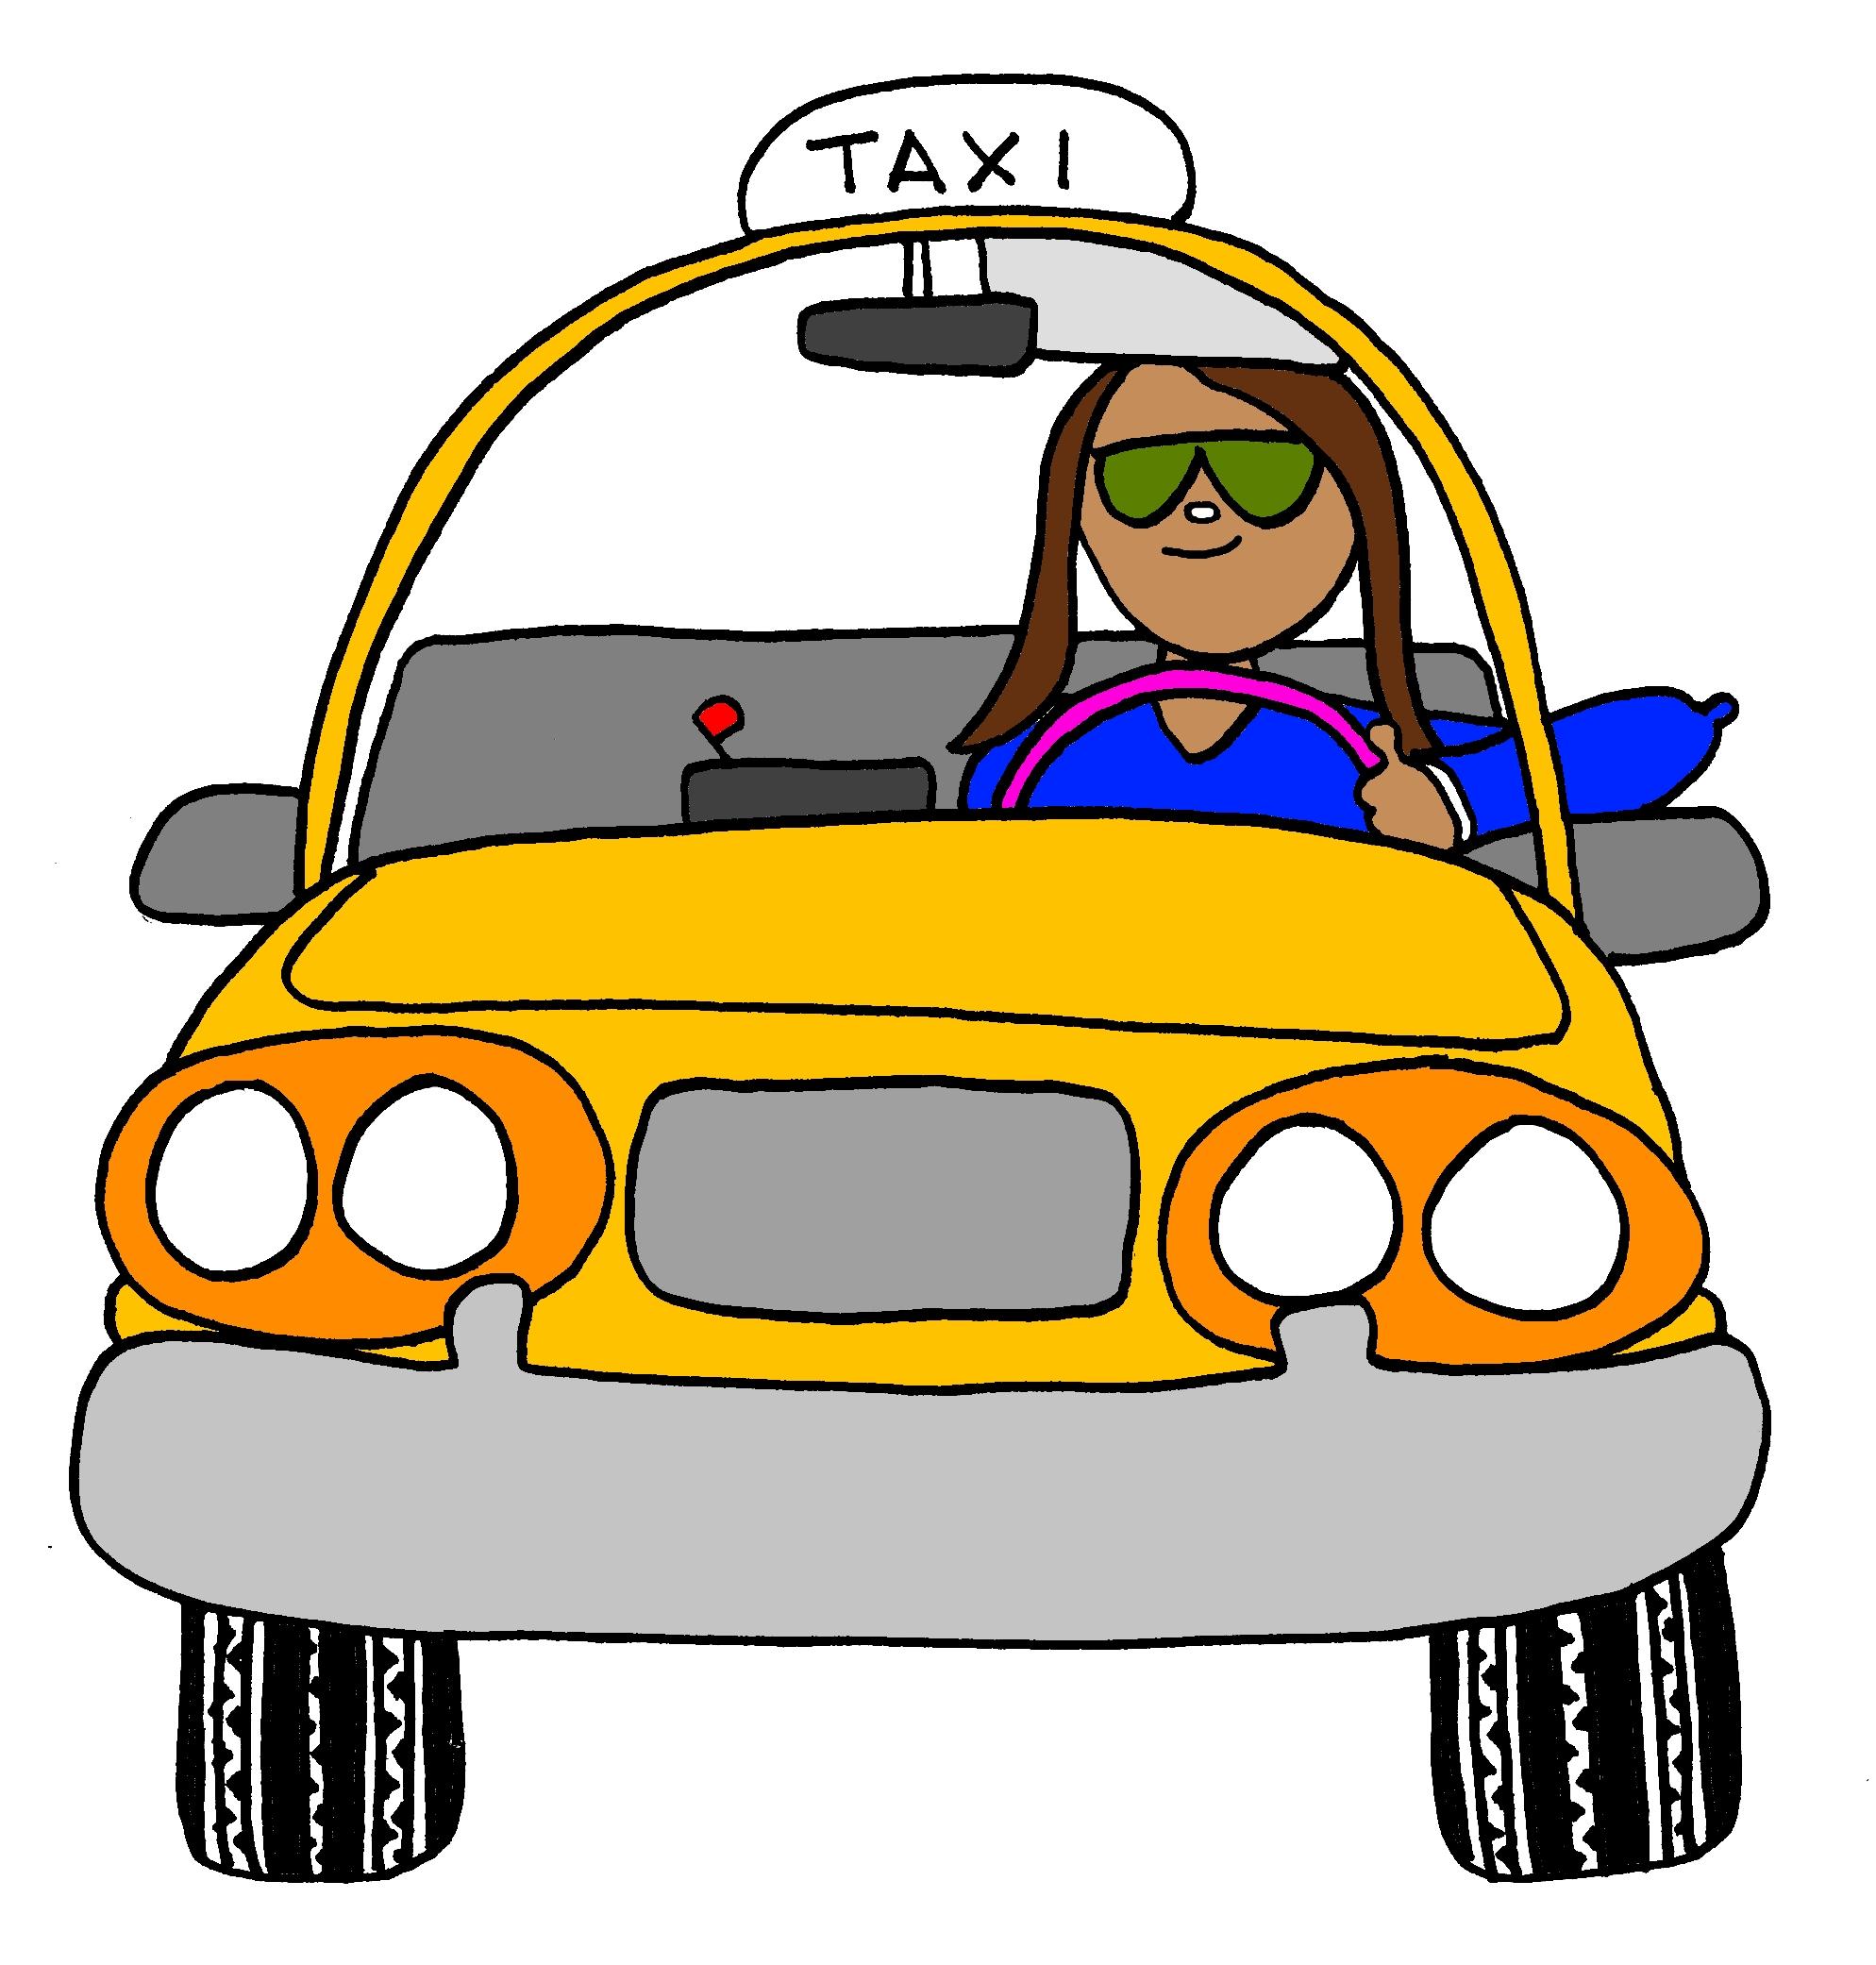 Taxi Color.jpg